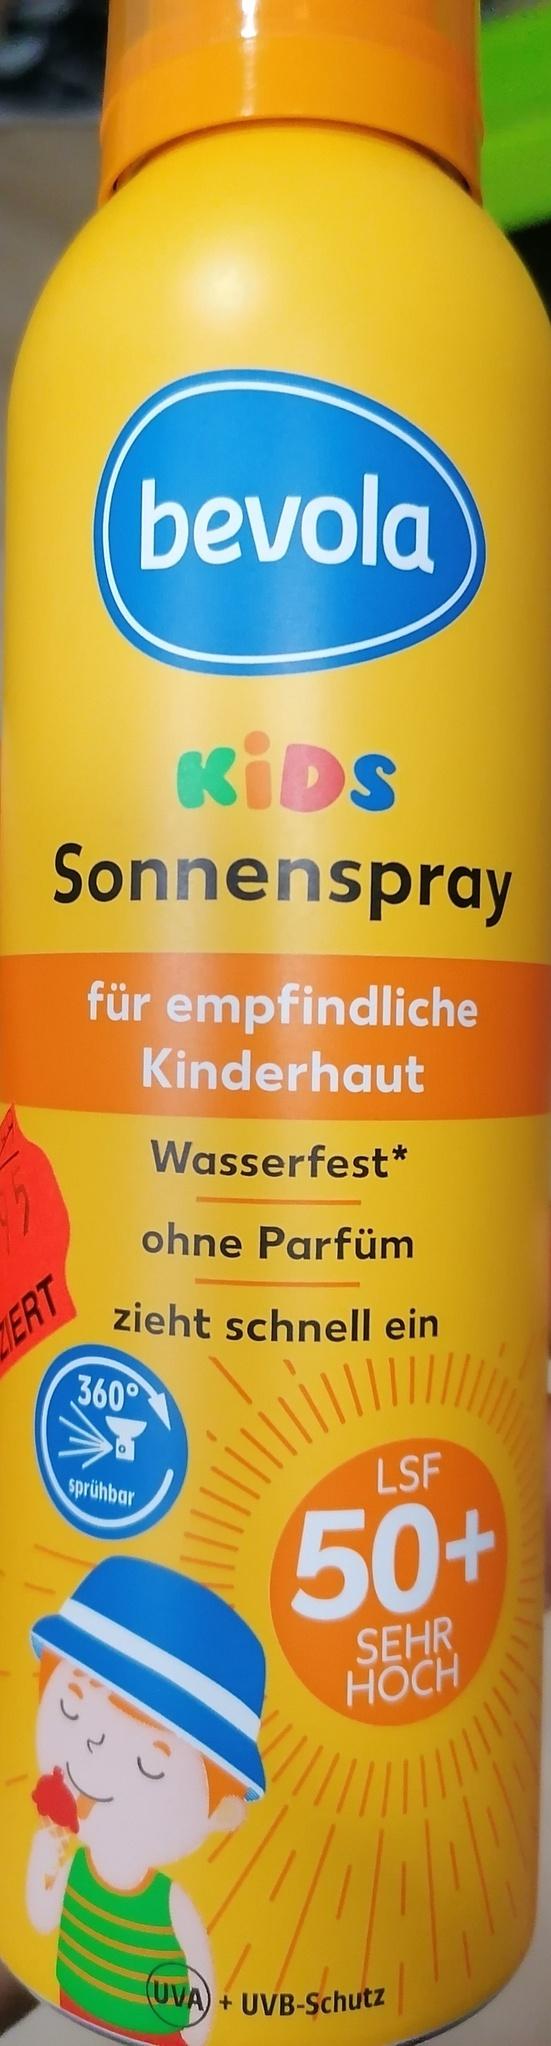 bevola Kids Sonnenspray LSF 50+